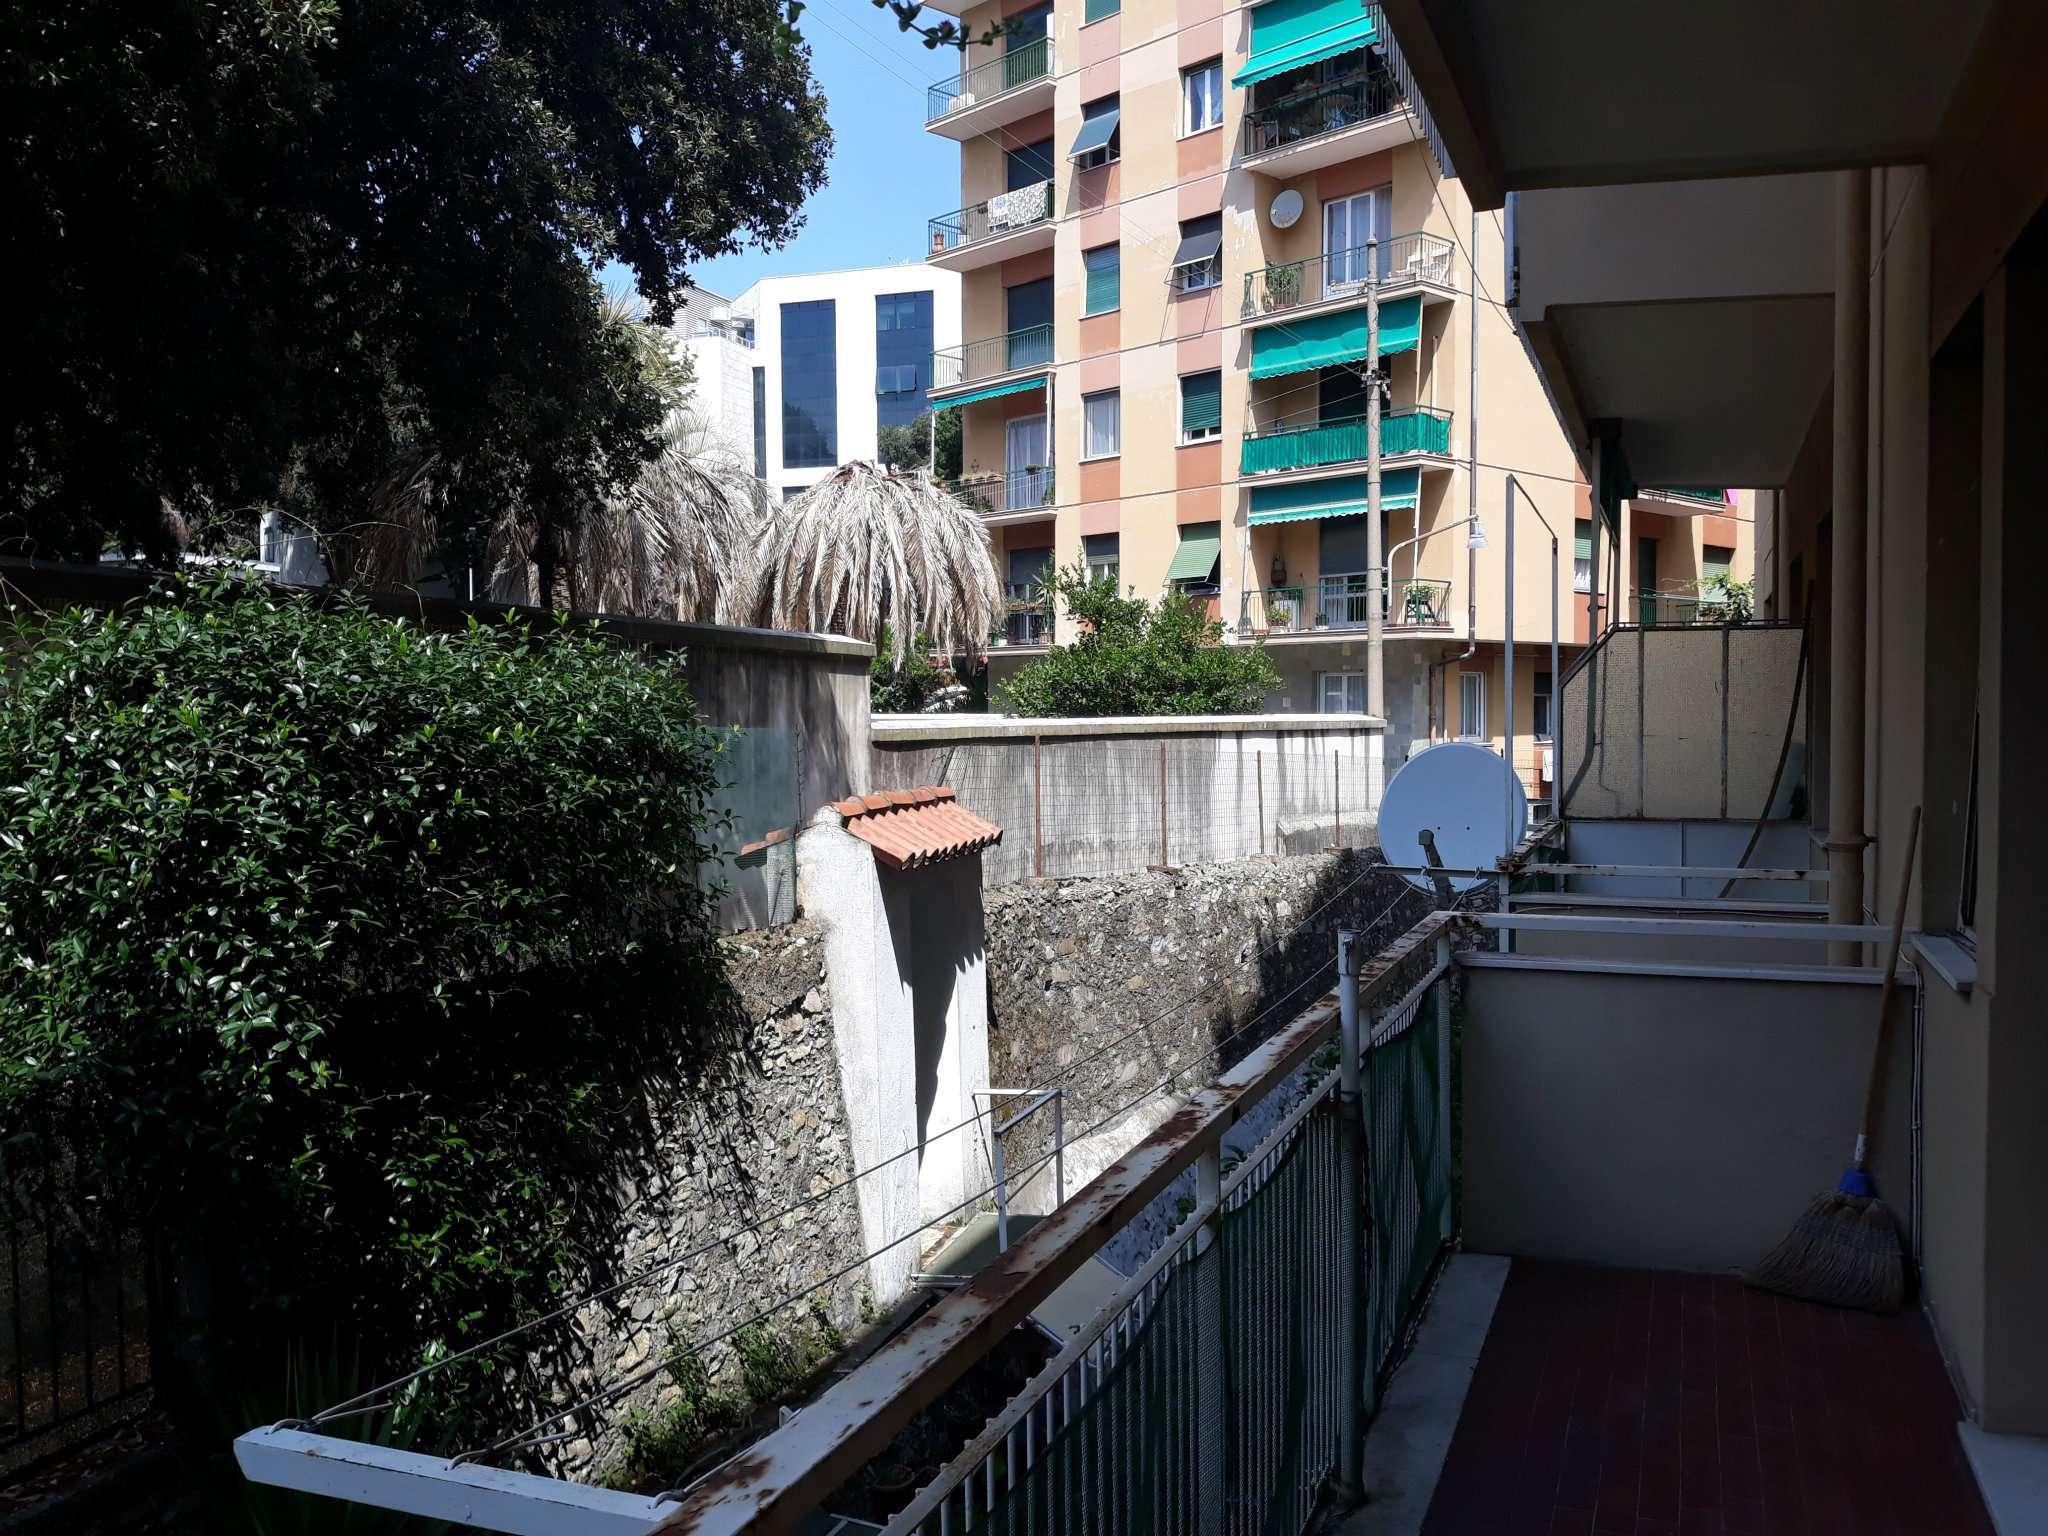 Foto 13 di Bilocale via carrara 128, Genova (zona Boccadasse-Sturla)